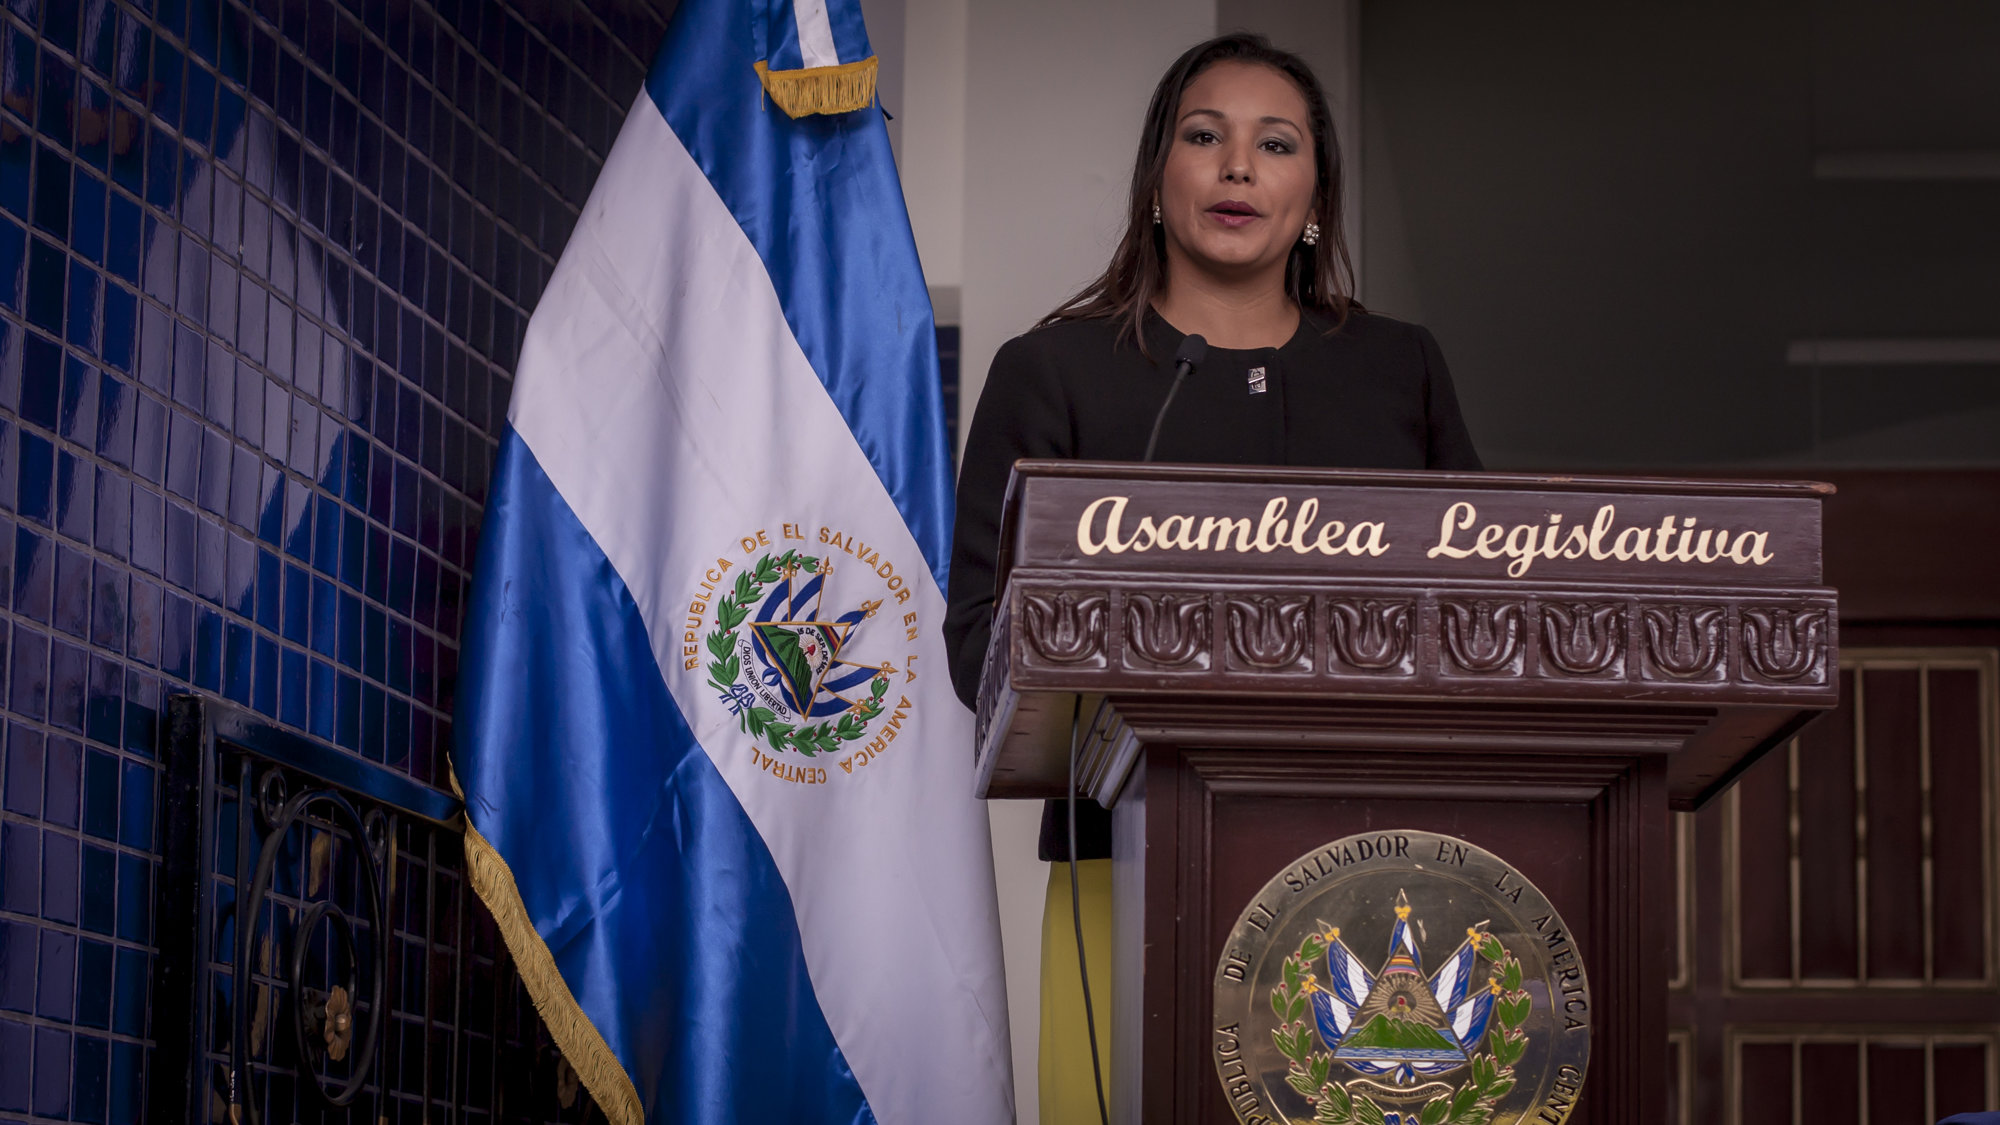 El ajedrez político alrededor de Cristina López